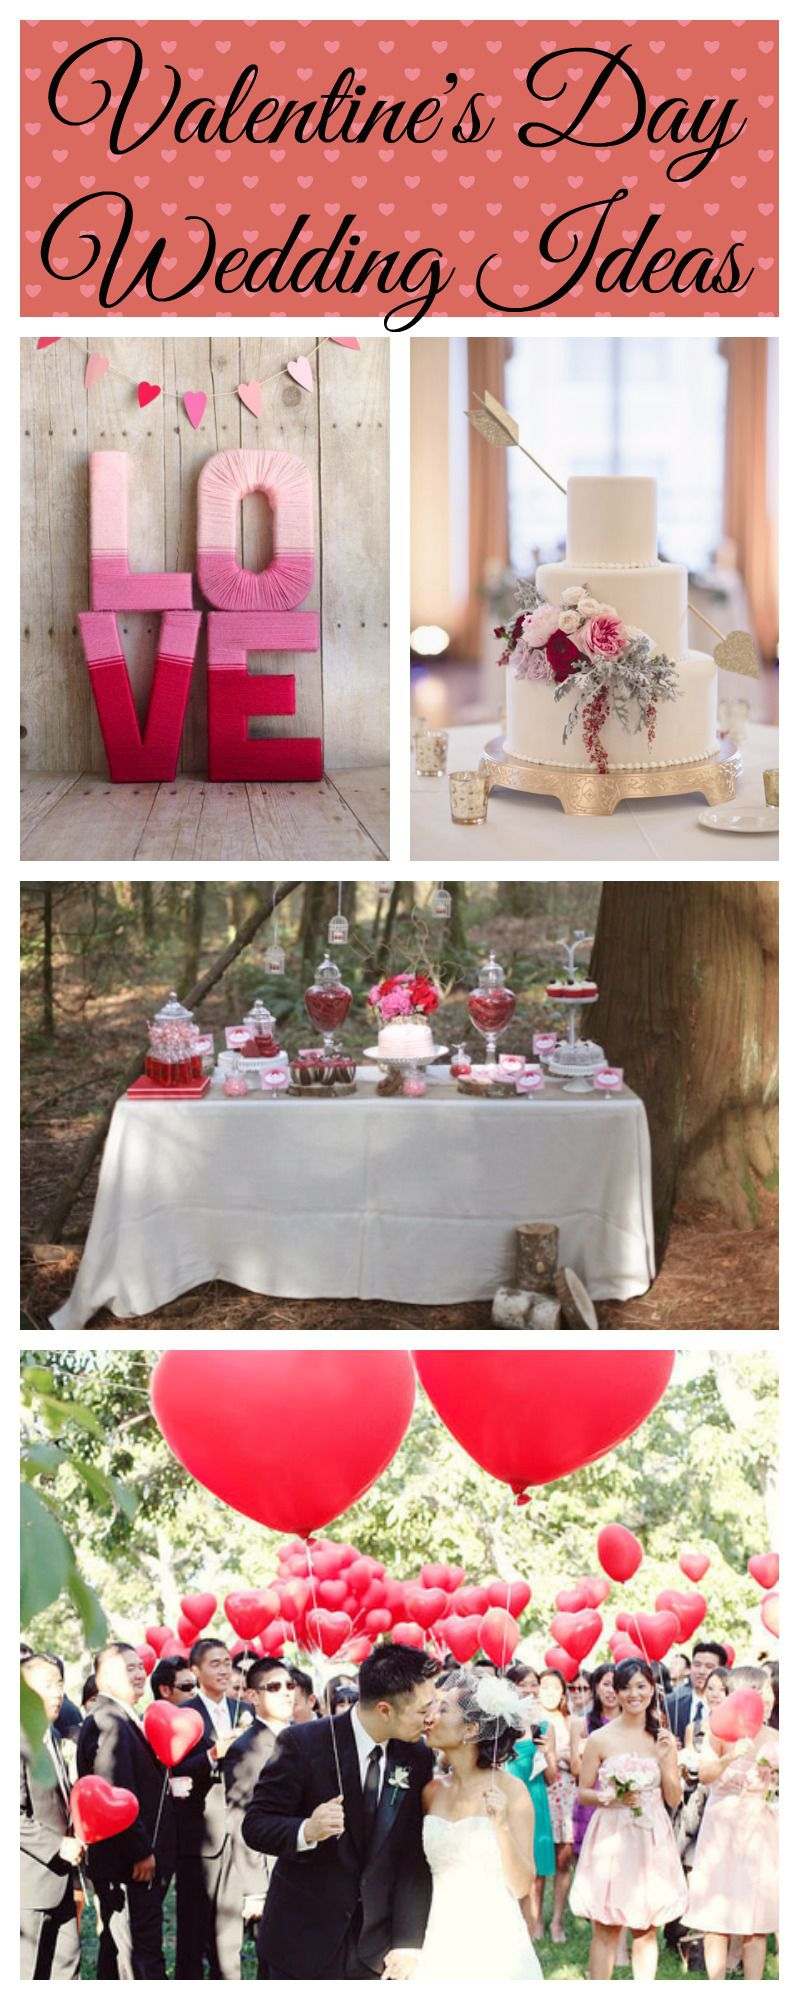 Valentine S Day Wedding Ideas Rustic Wedding Chic